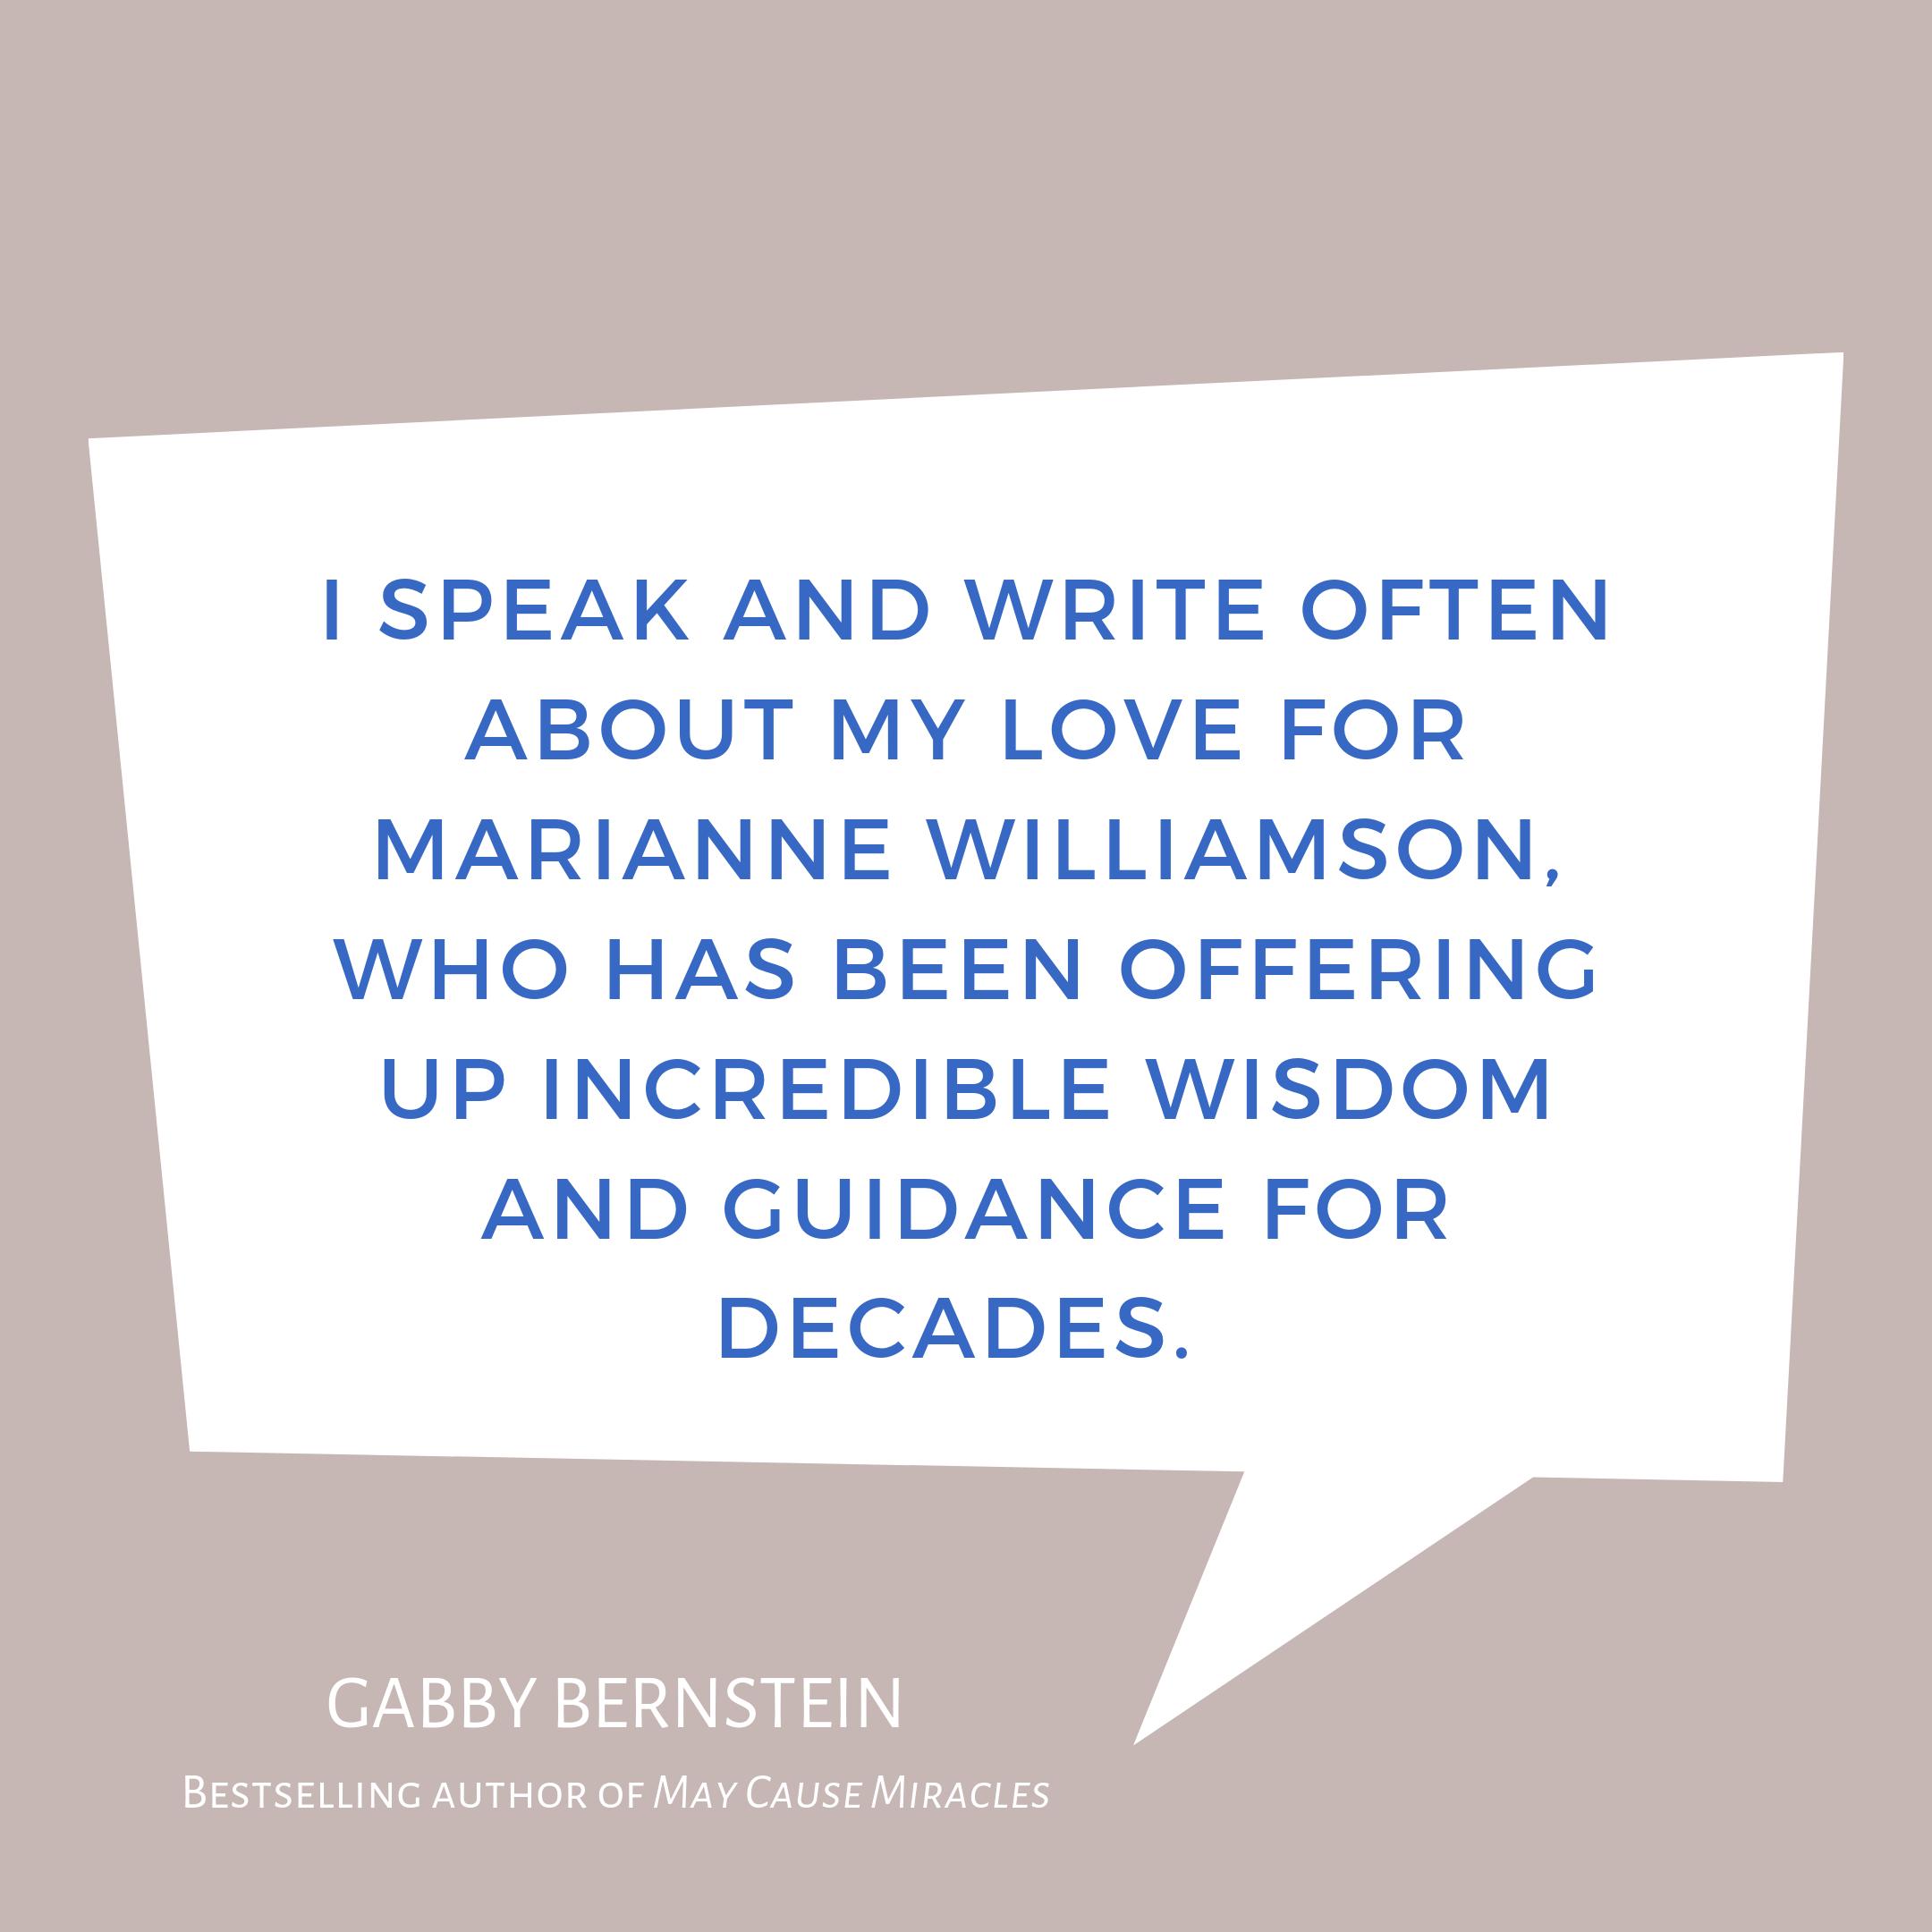 gabby testimonial .png